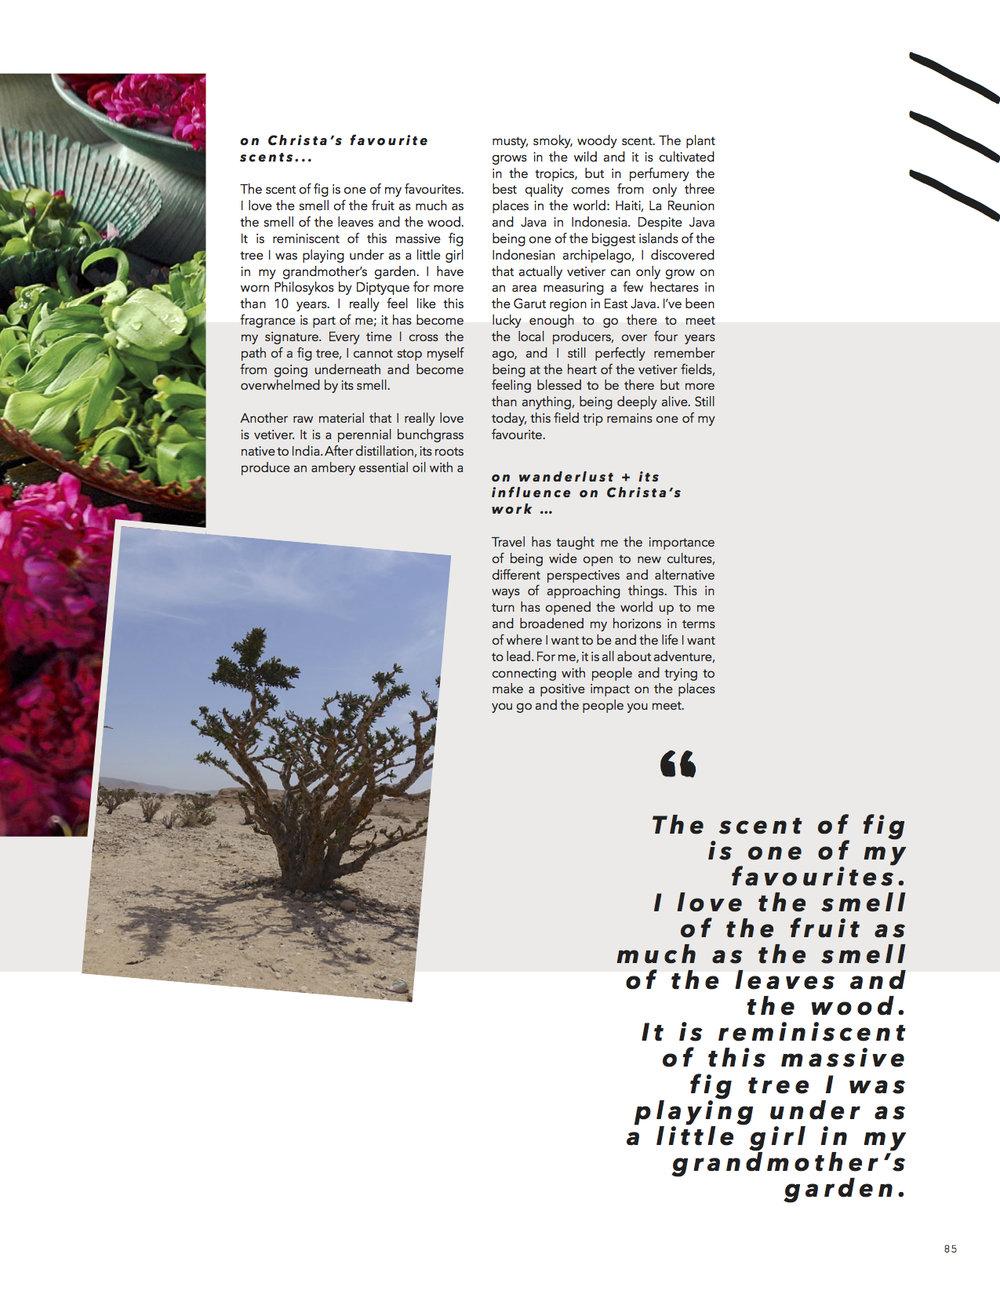 Unsubscribed Magazine 4.jpg